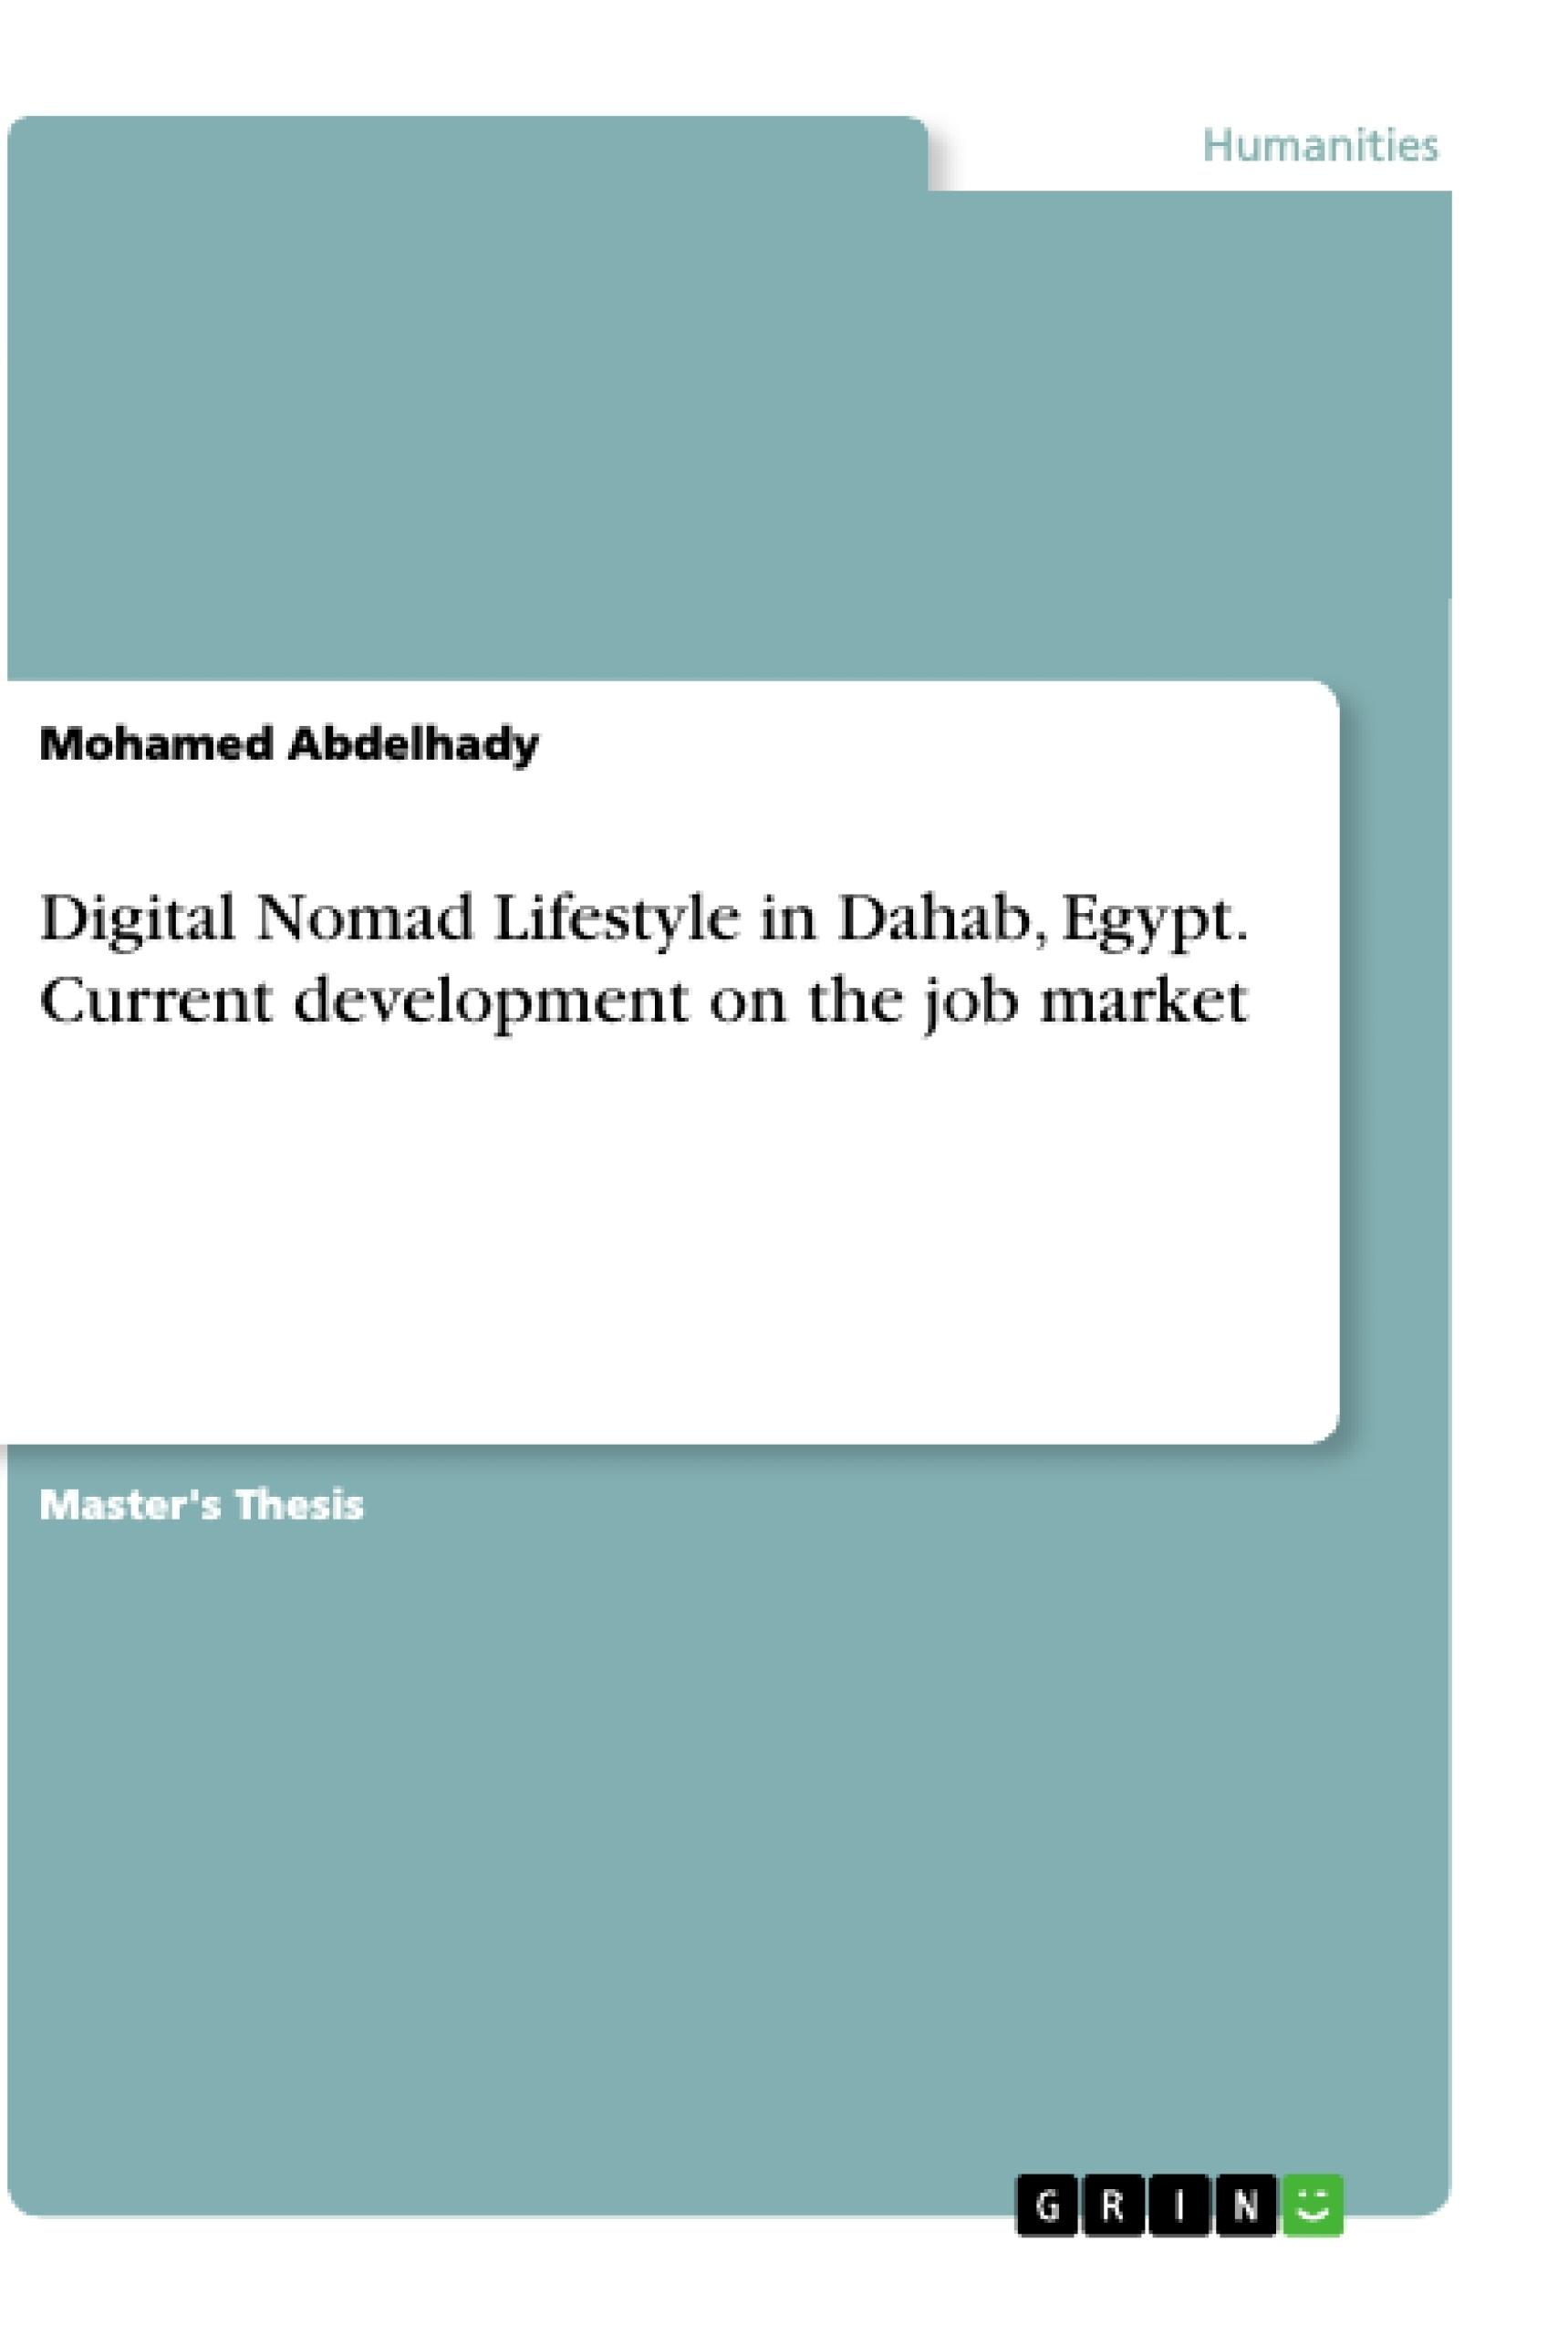 Title: Digital Nomad Lifestyle in Dahab, Egypt. Current development on the job market